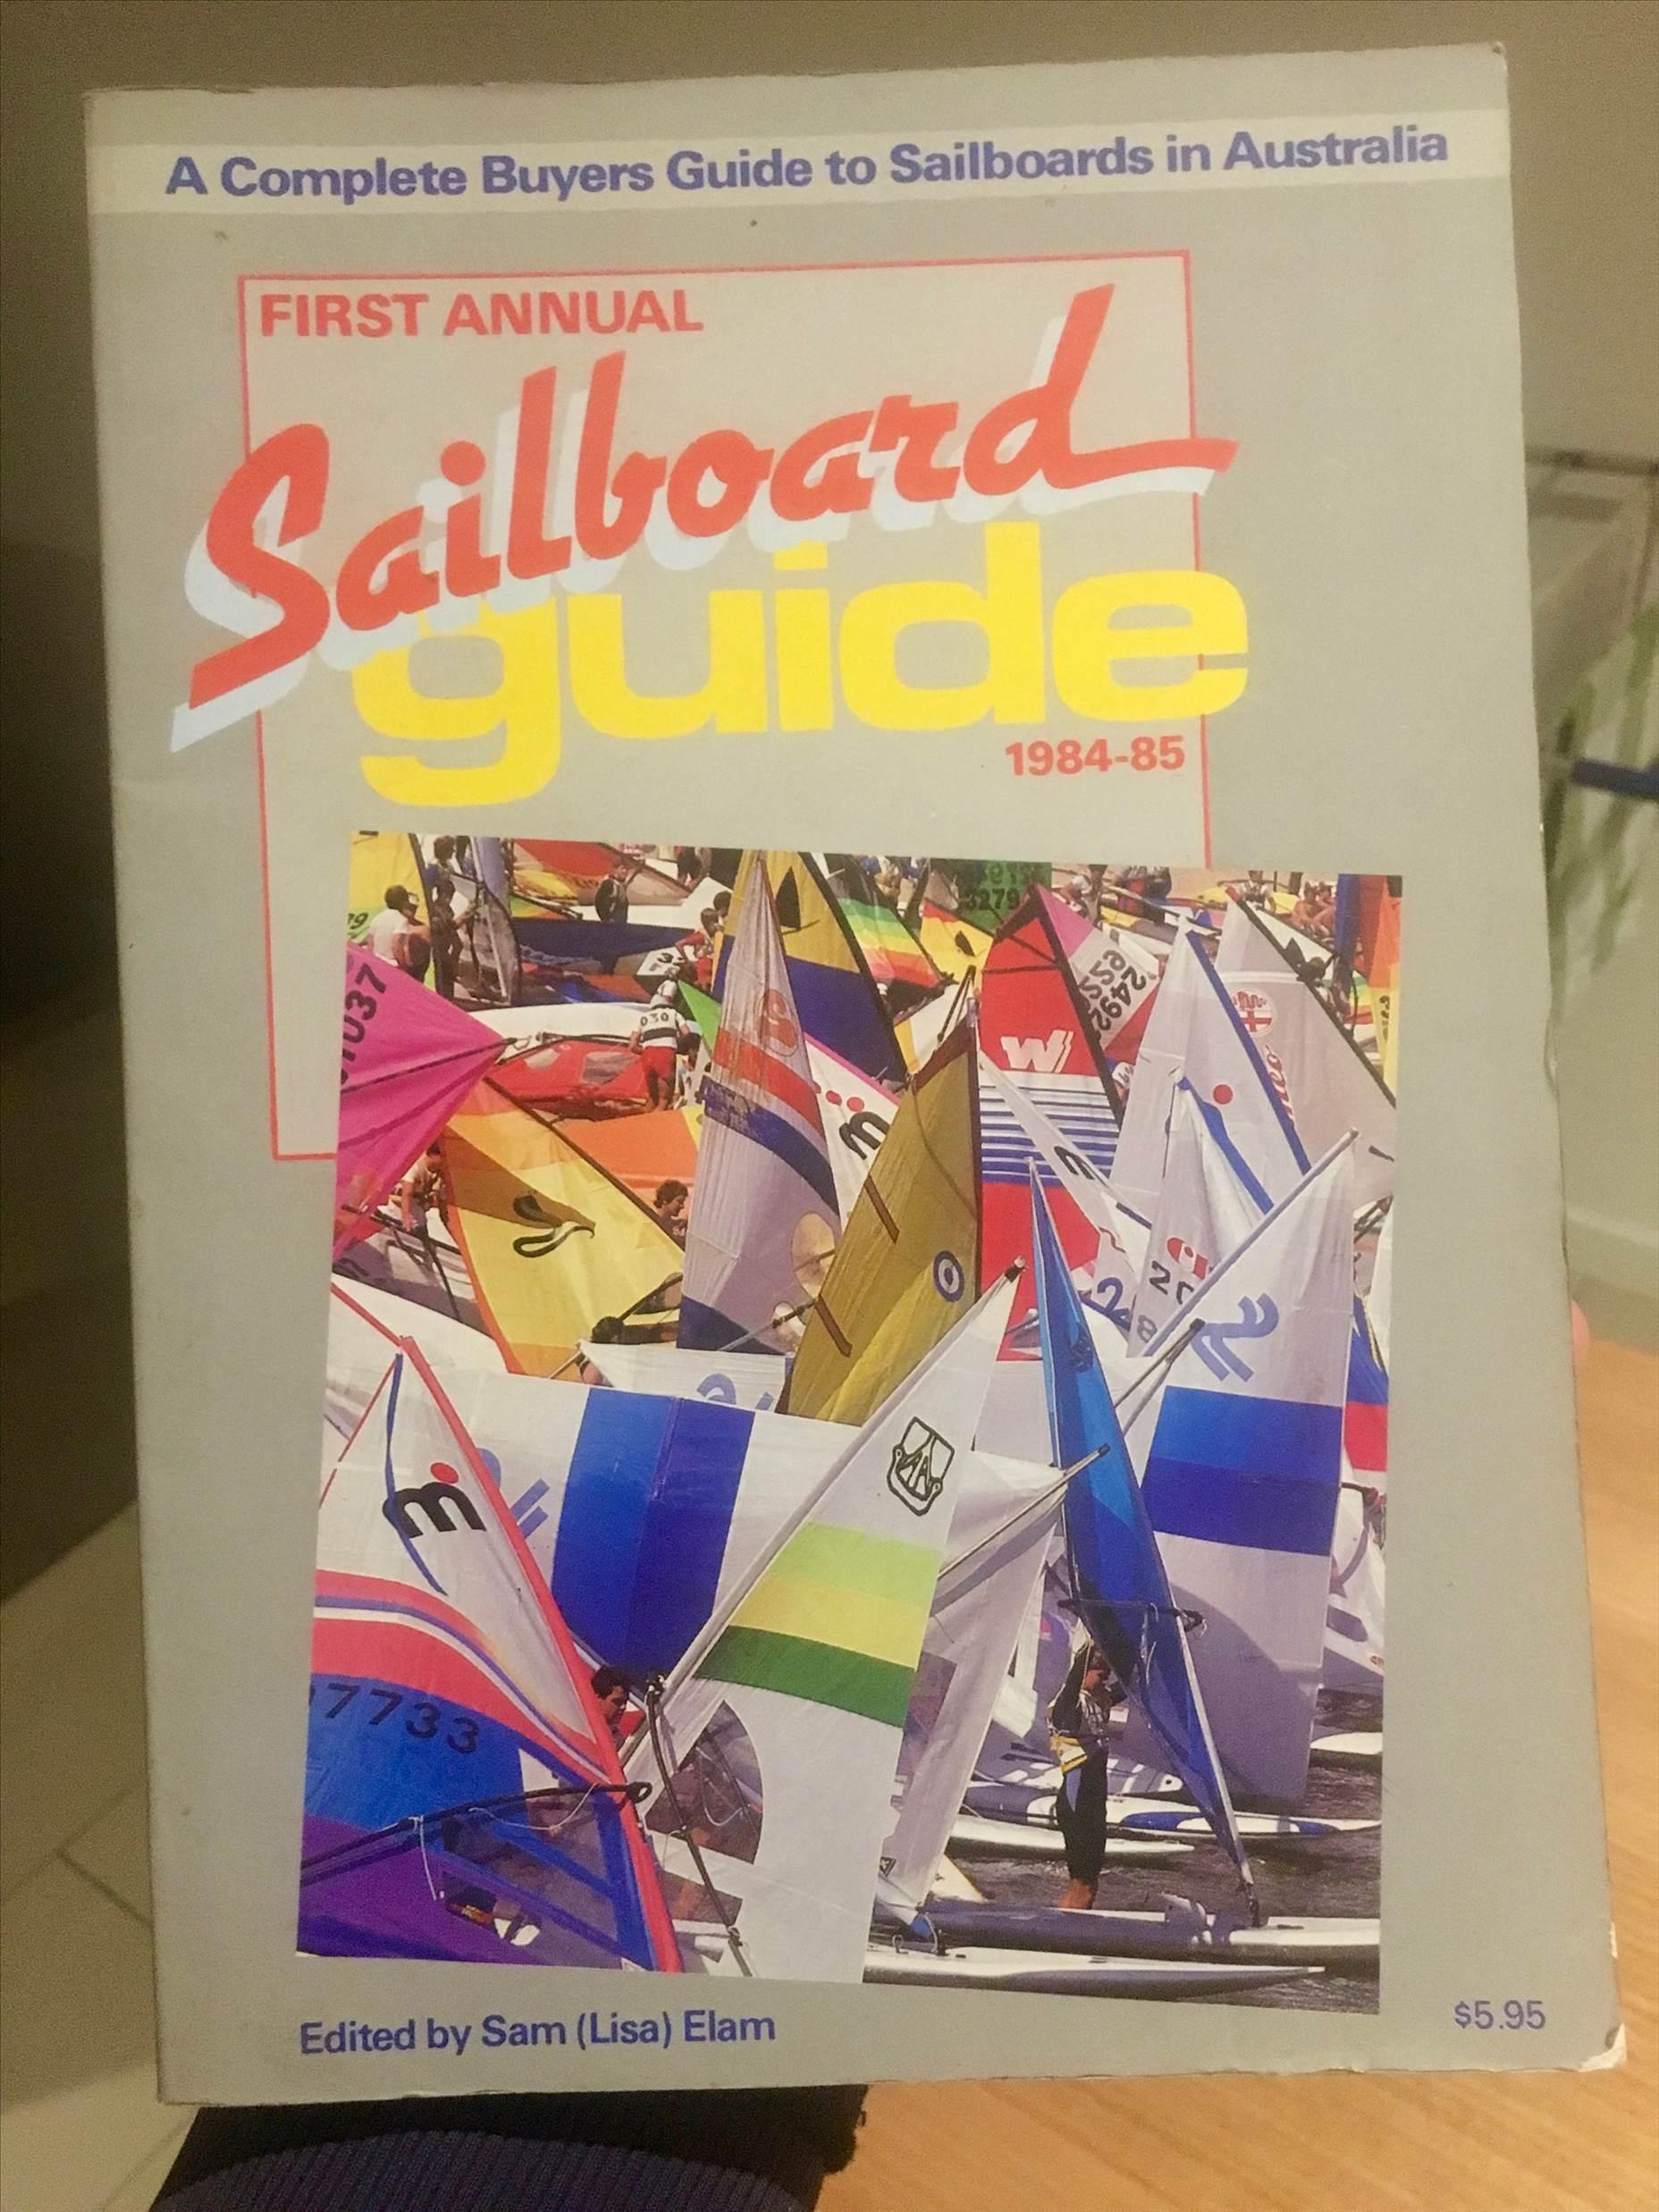 First Annual Sailboard Guide 1984-85 Australia | Windsurfing Forums